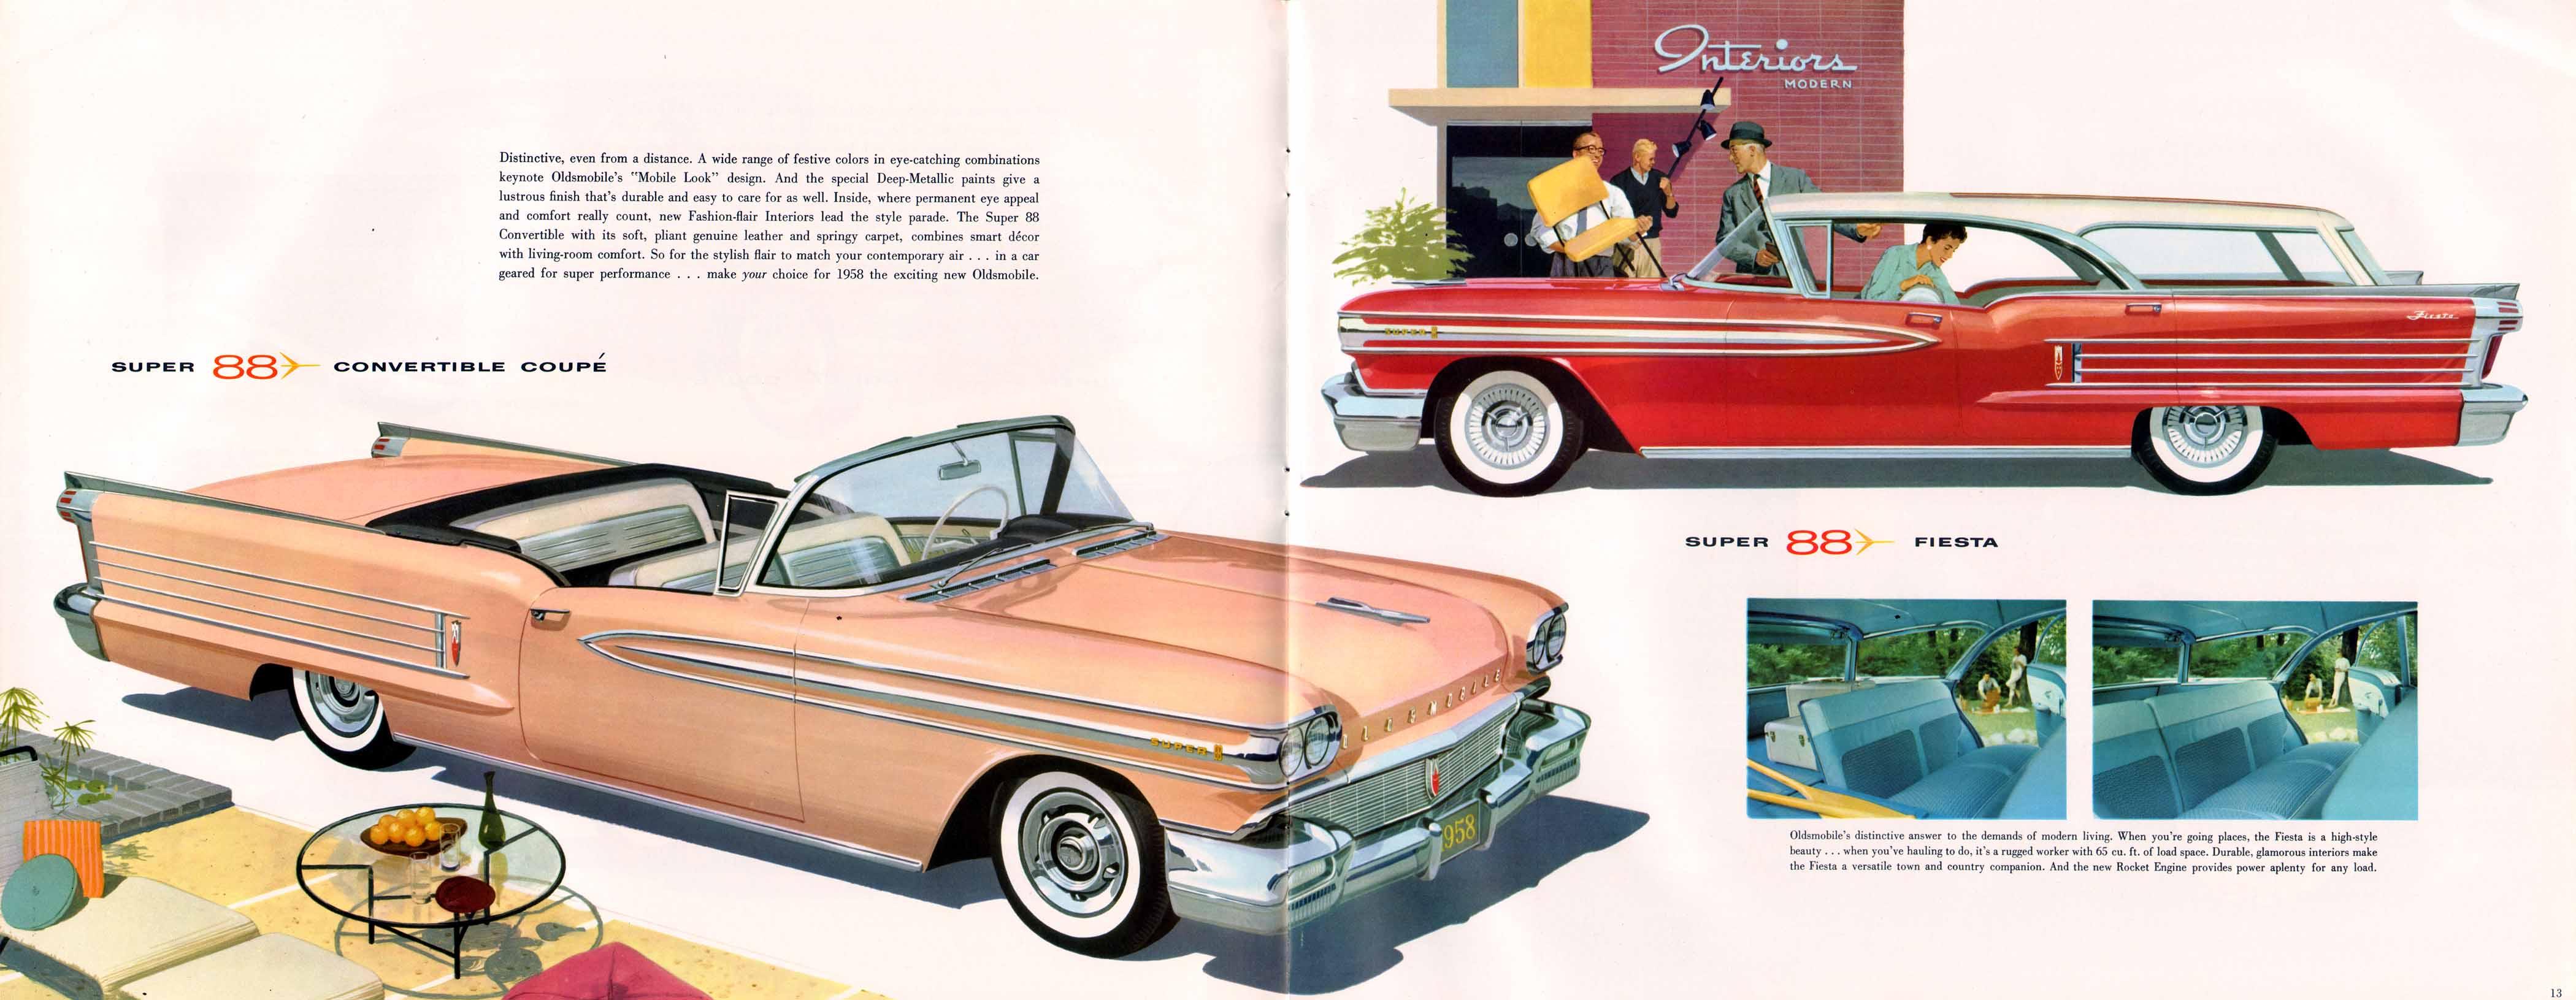 190628996701849402 as well savannahclassiccars besides Original Auto Interiors as well 436 Photos Chevrolet Camaro in addition 7426 Chevrolet Camaro 1988 5. on camaro car